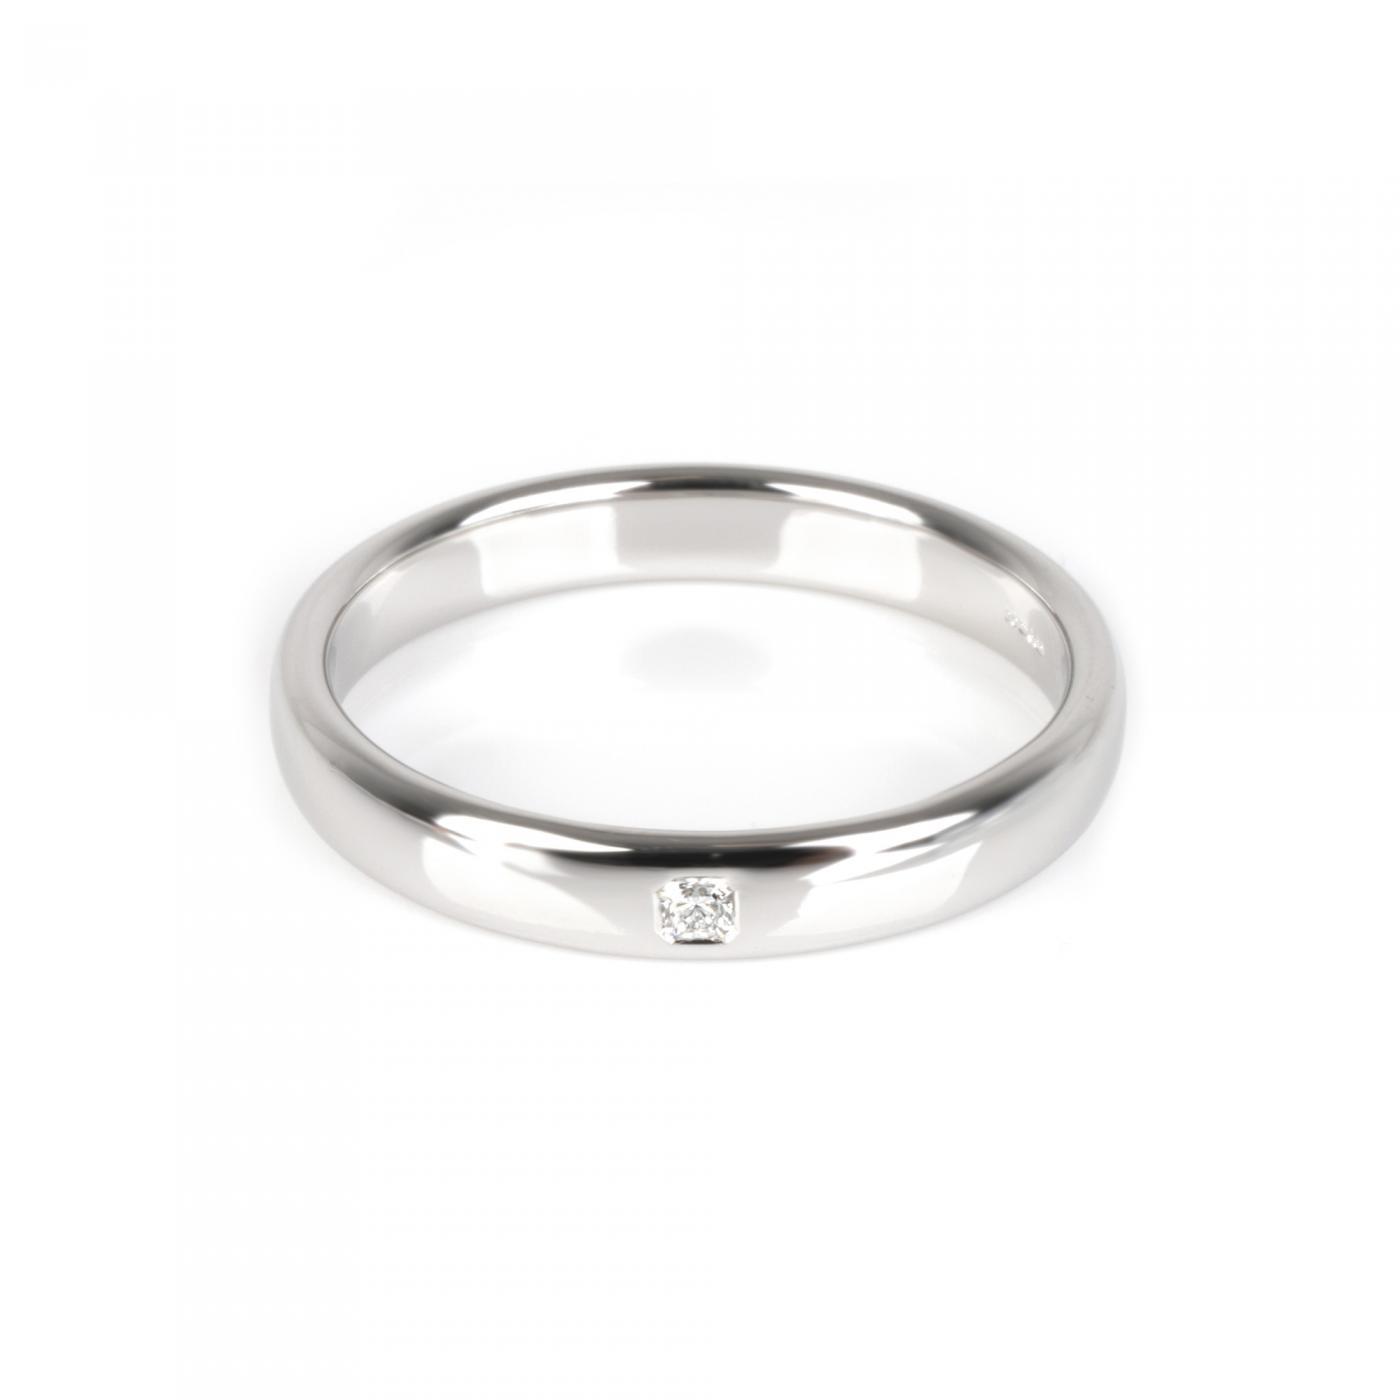 Tiffany And Co Tiffany Co Lucida Diamond Men S Ring In Platinum 0 05 Ctw